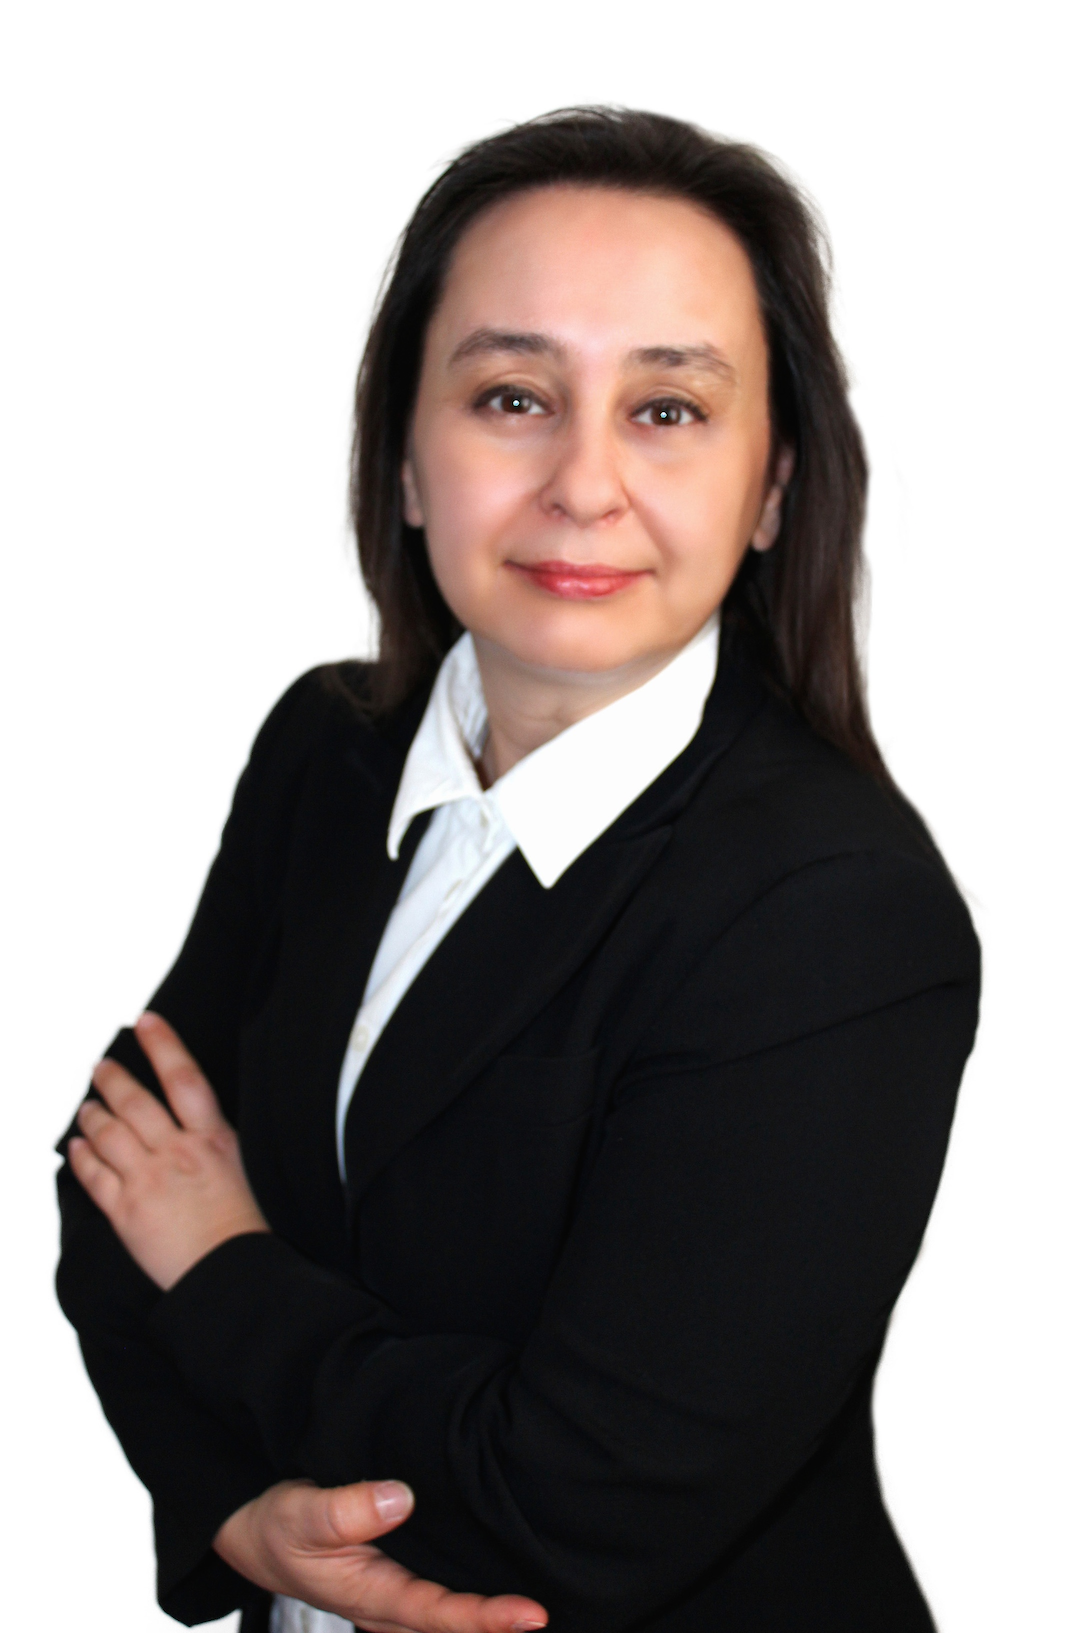 ROMANA LANNER